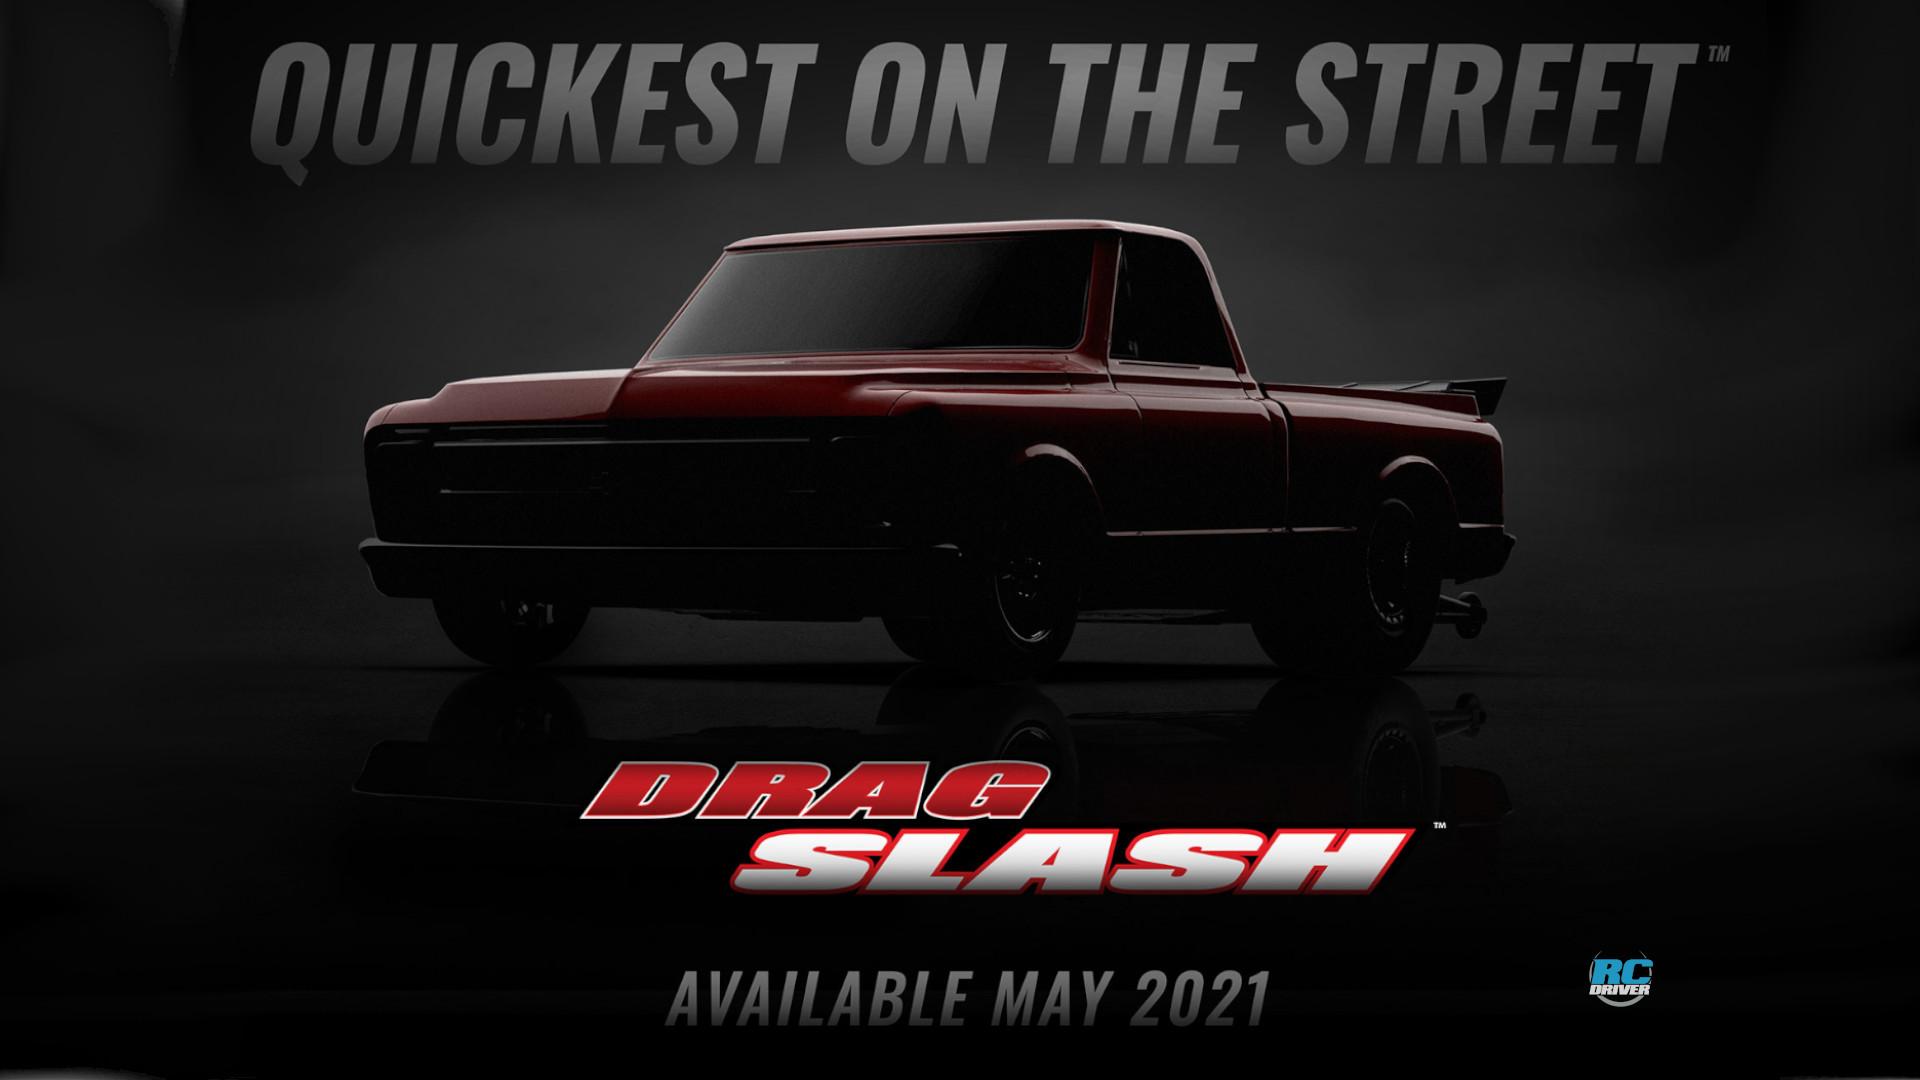 Traxxas Teases Drag Slash—Available May 2021